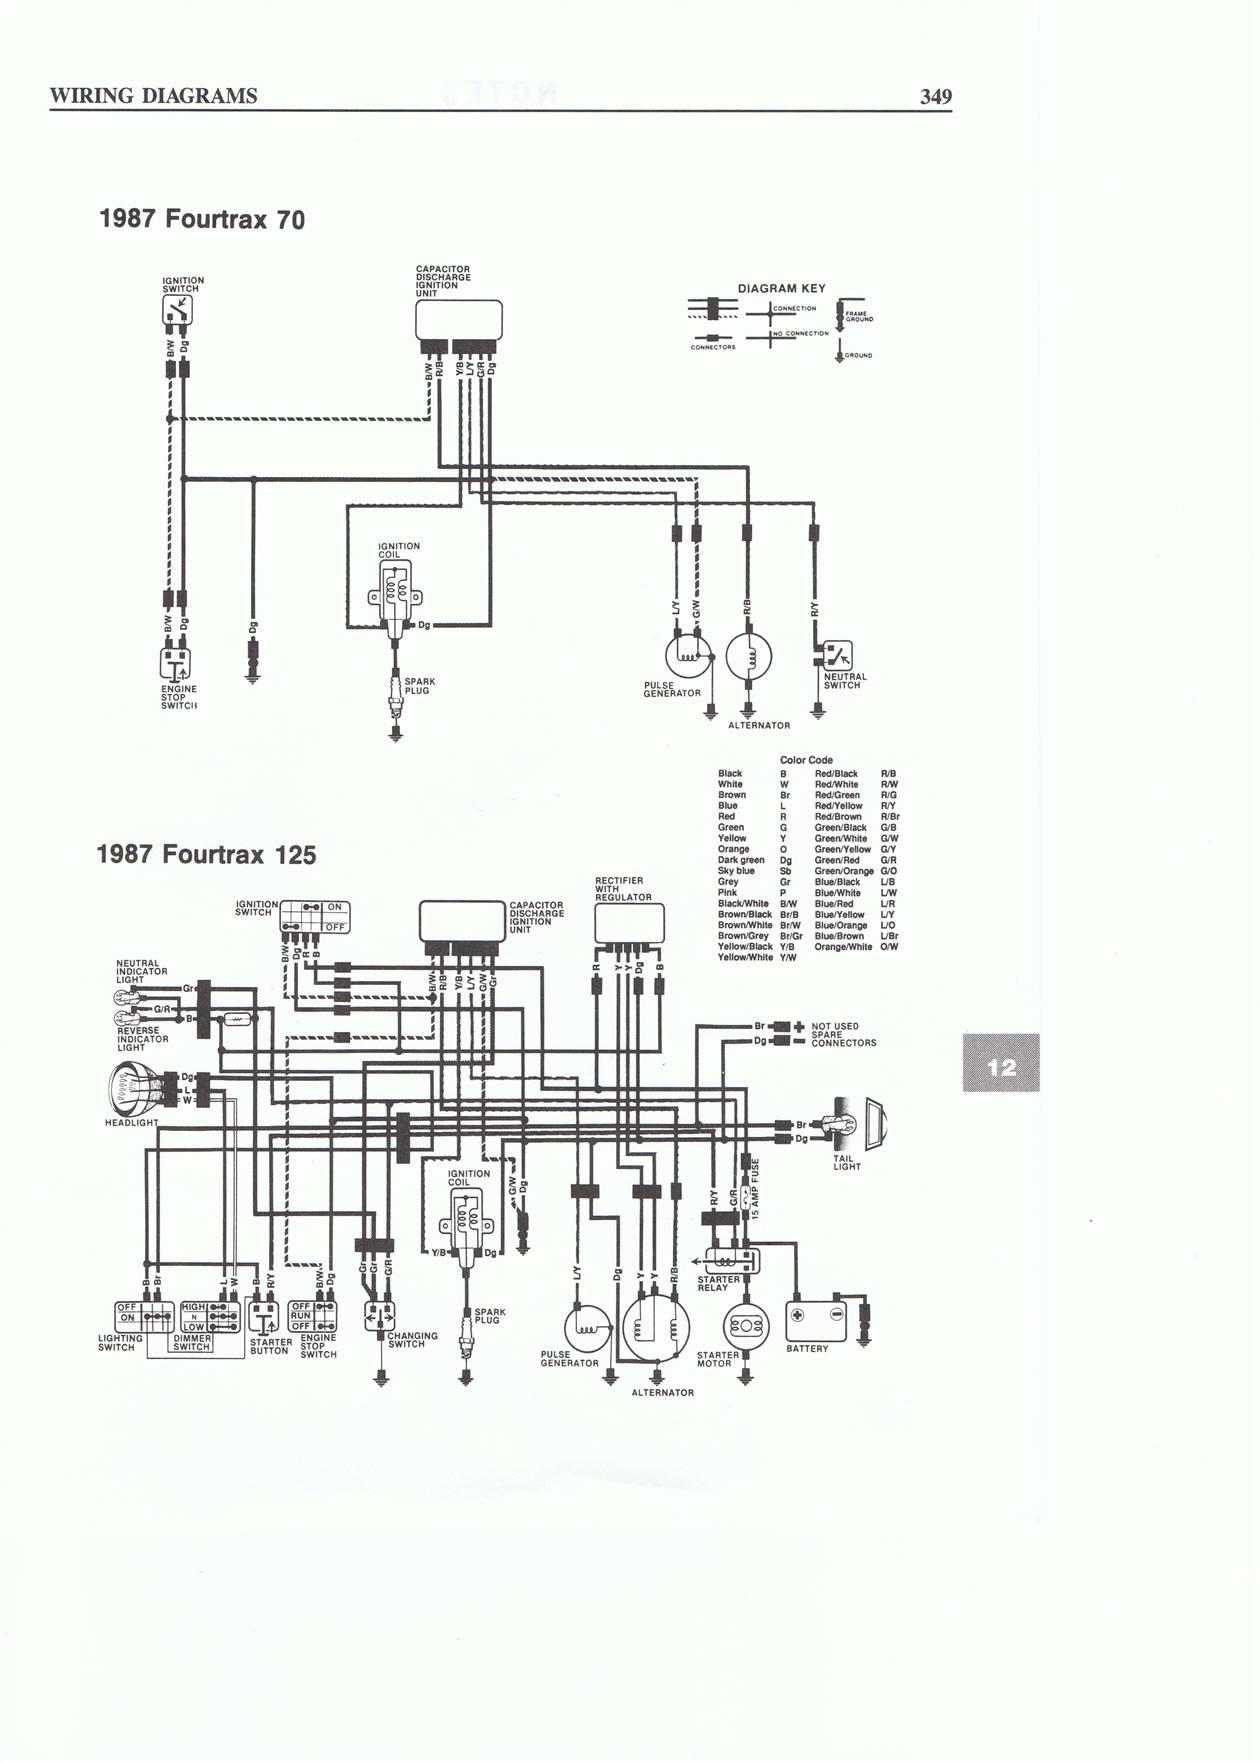 medium resolution of kazuma 50cc wiring diagram wiring diagrams roketa 90cc atv wiring diagram kazuma 150cc wiring diagram wiring